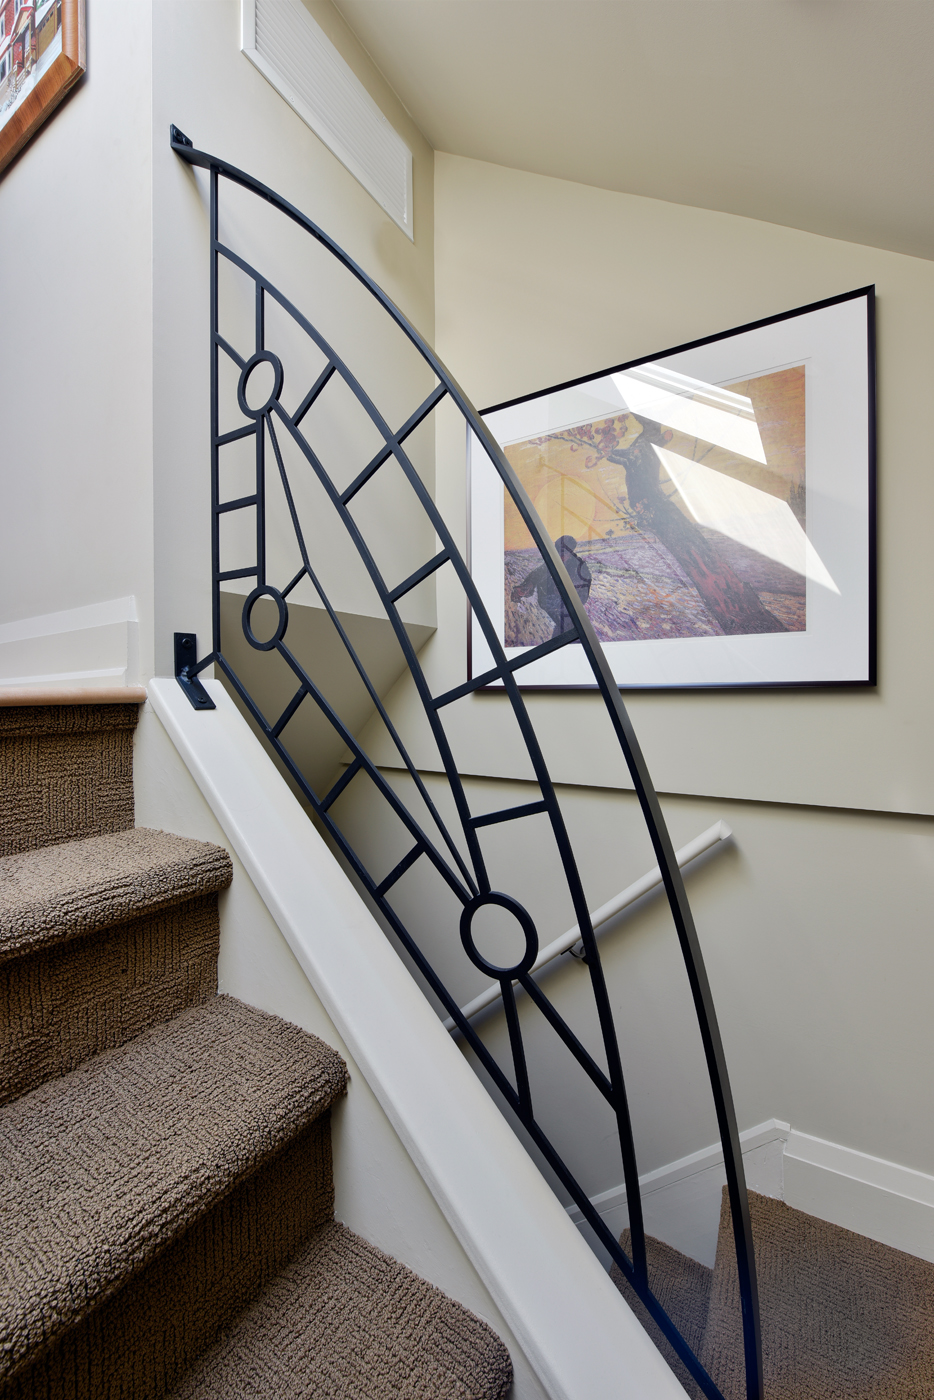 Smith stairway 1.jpg